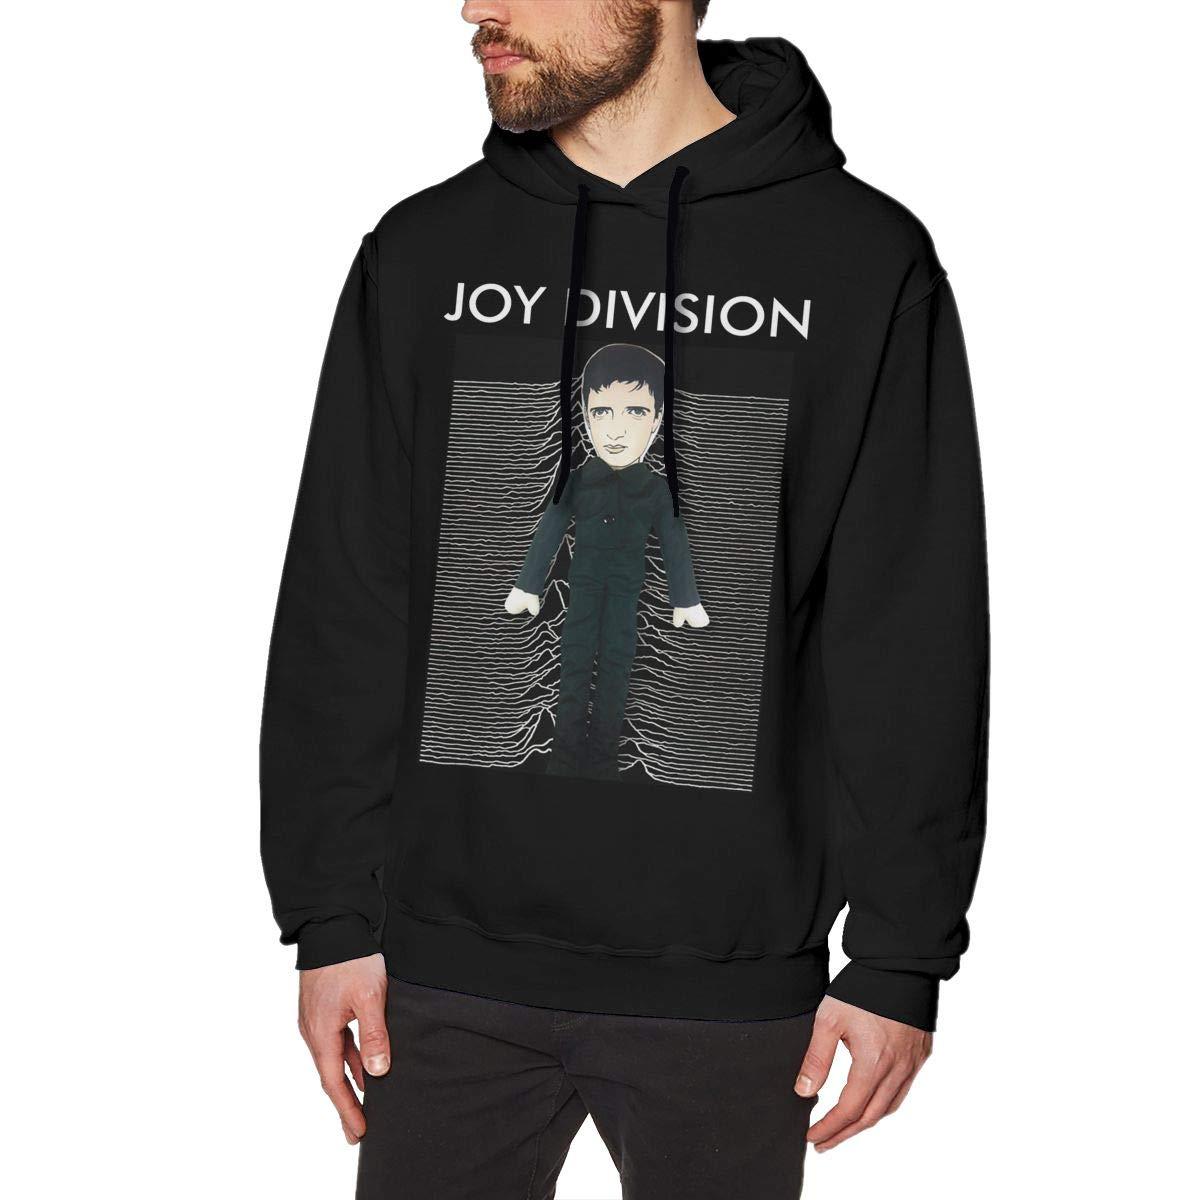 Kangtians Dknpglyum Joy Division Hooded 8910 Shirts